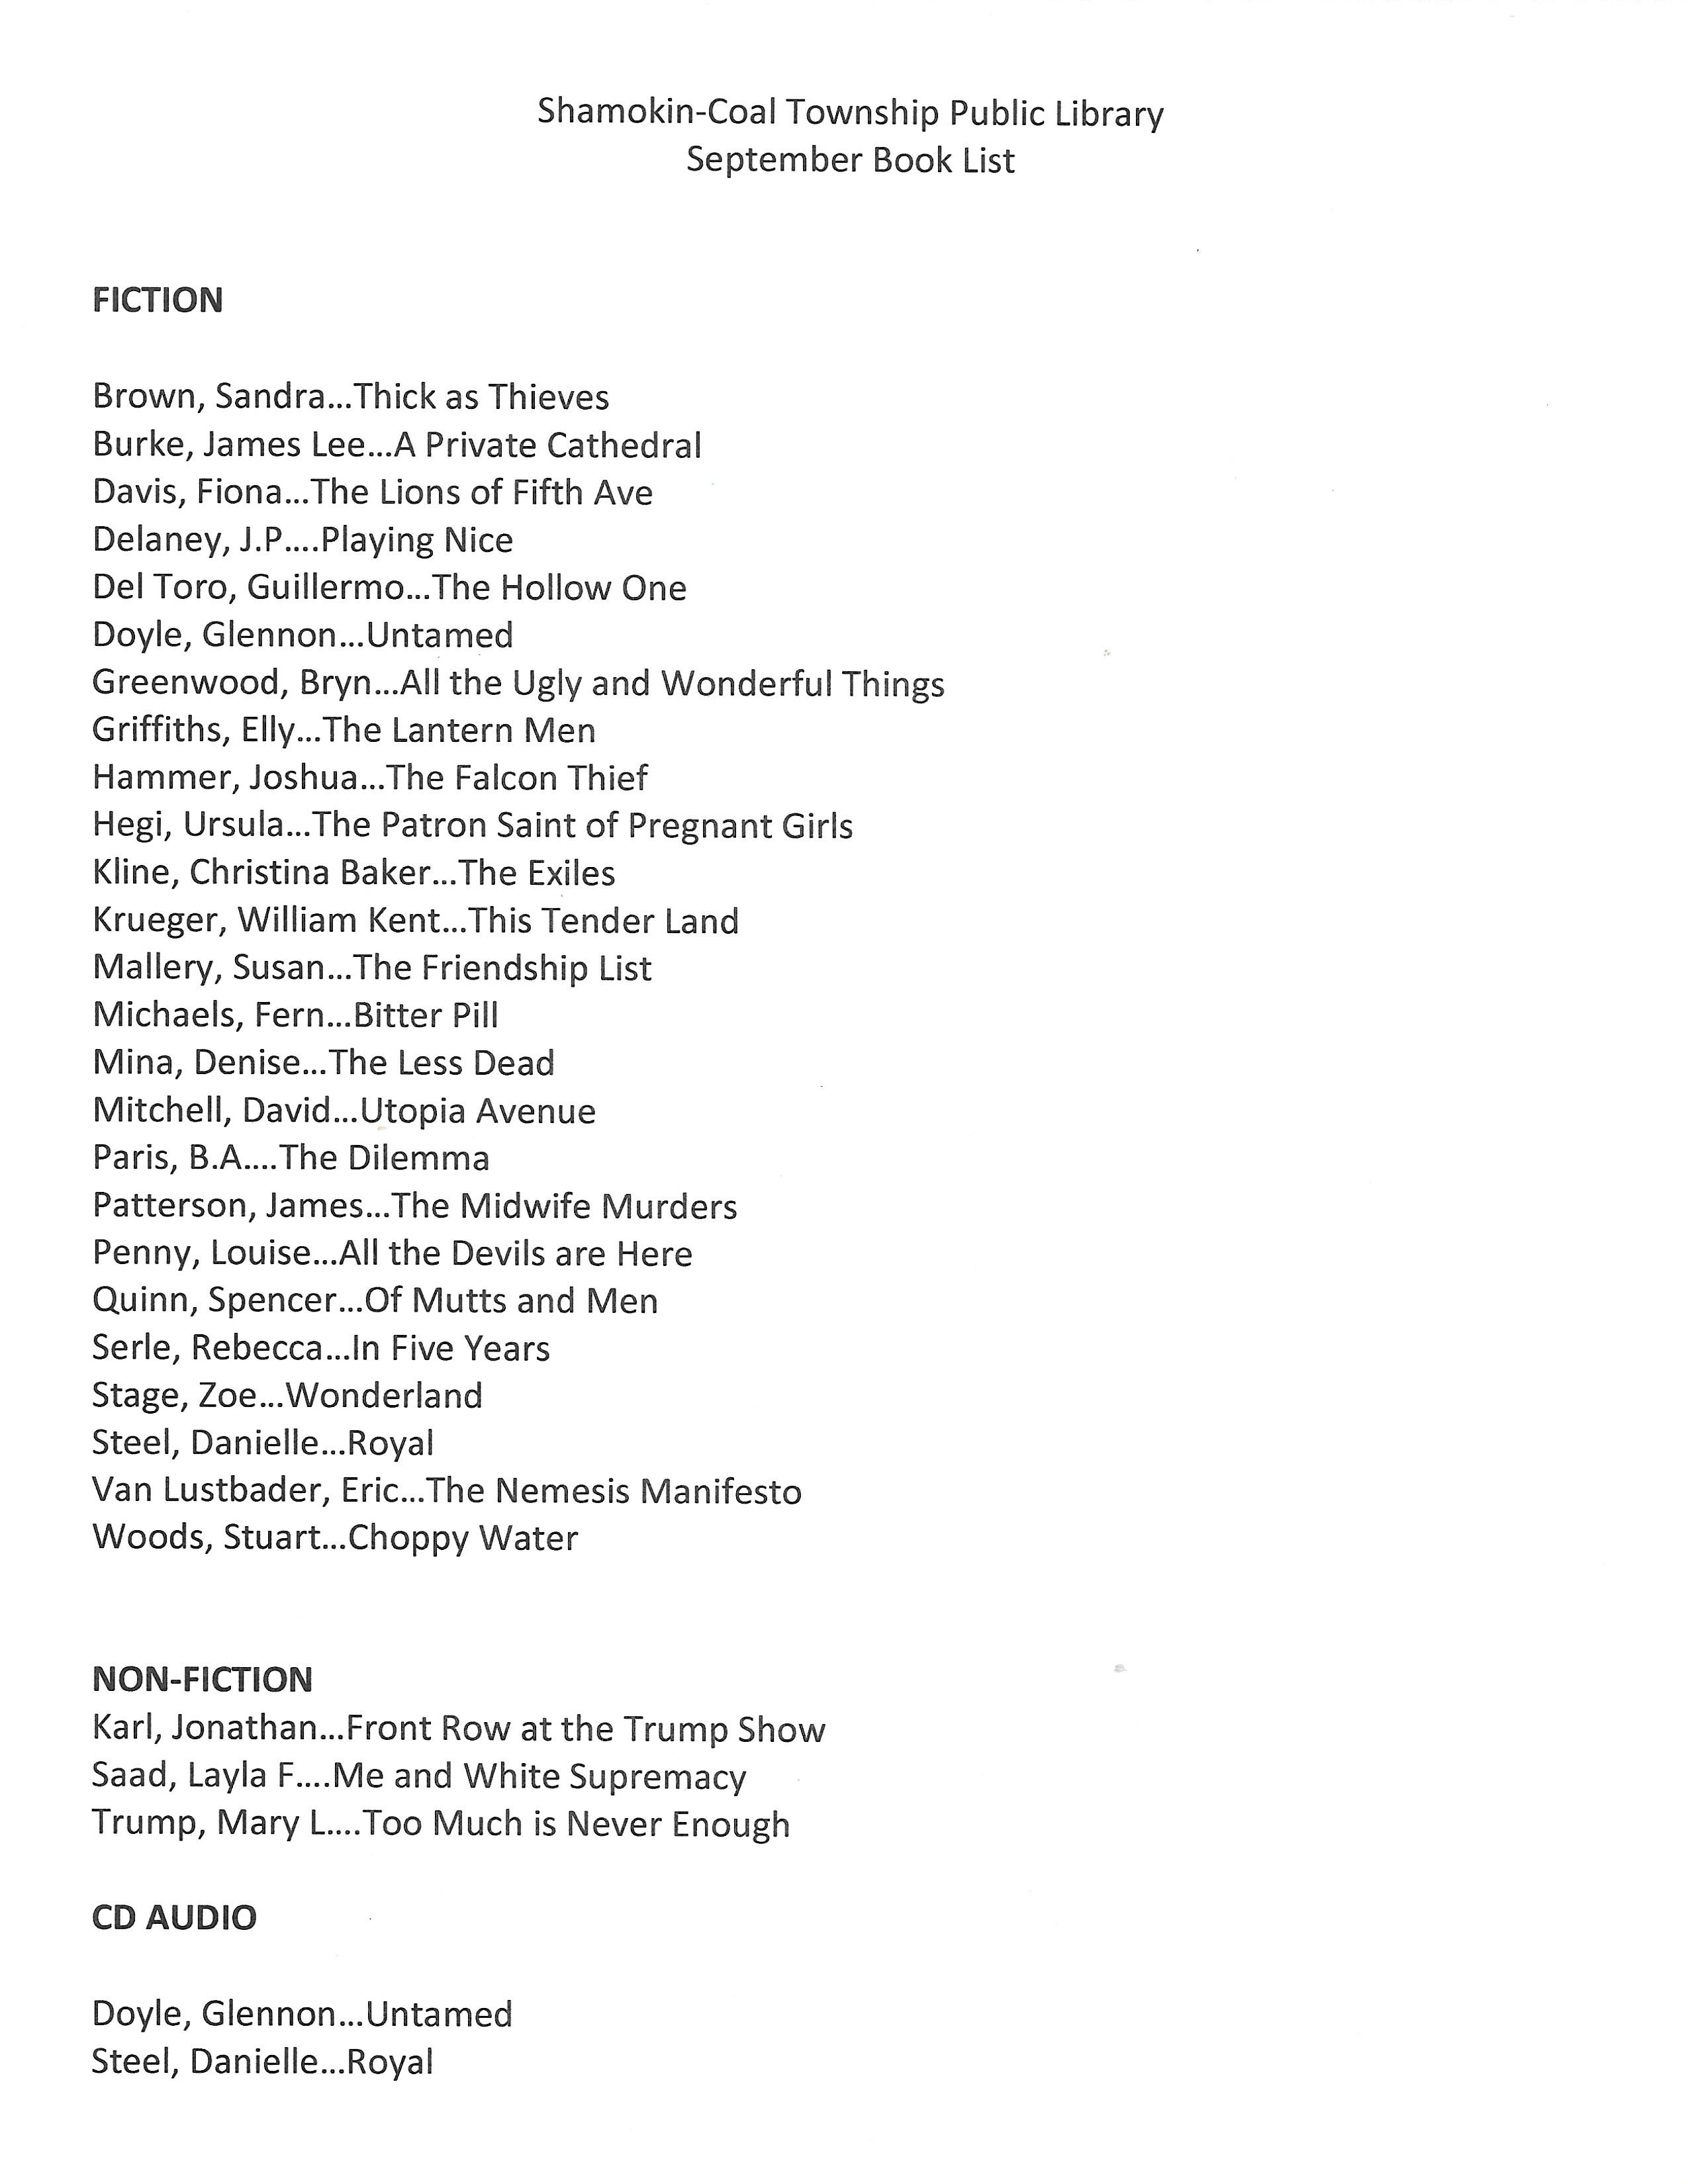 September 2020 Book List